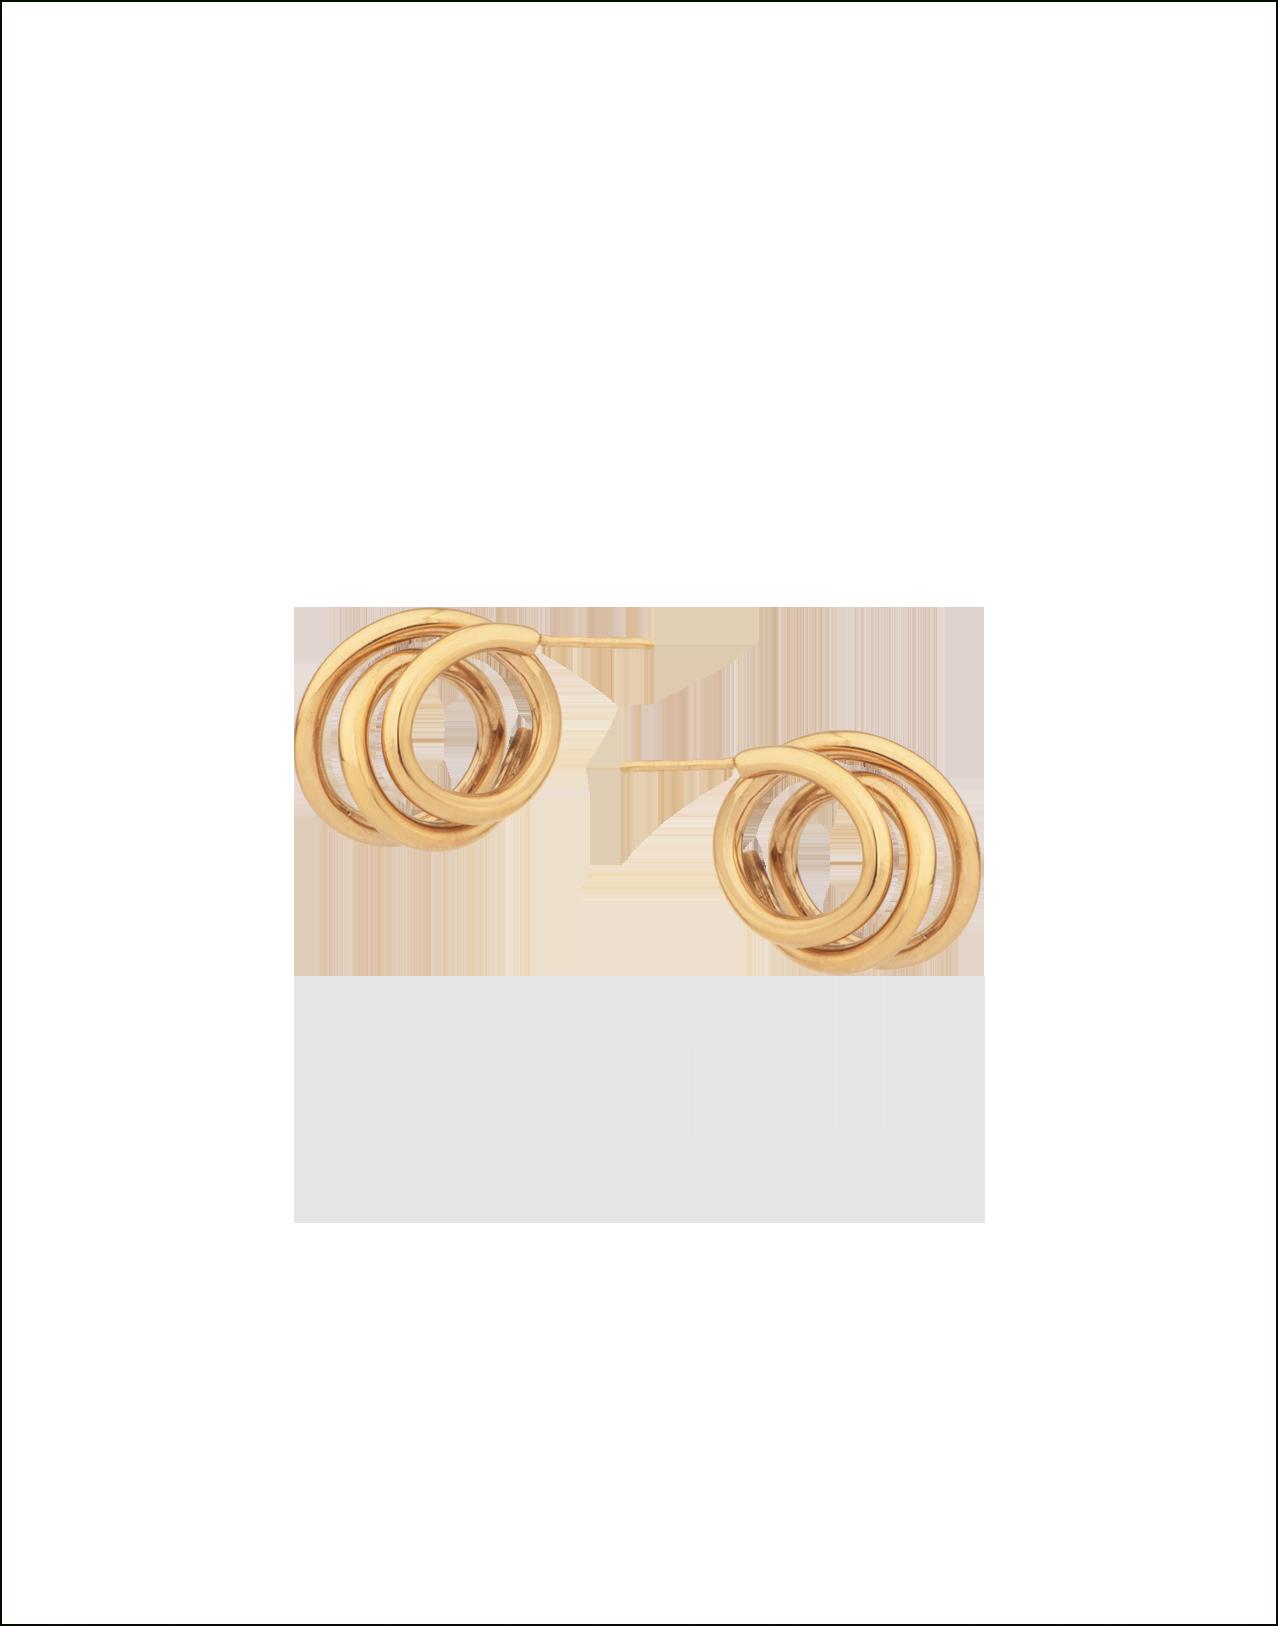 Completedworks-Earrings-Gold-Vermeil-Flow-3-1.png